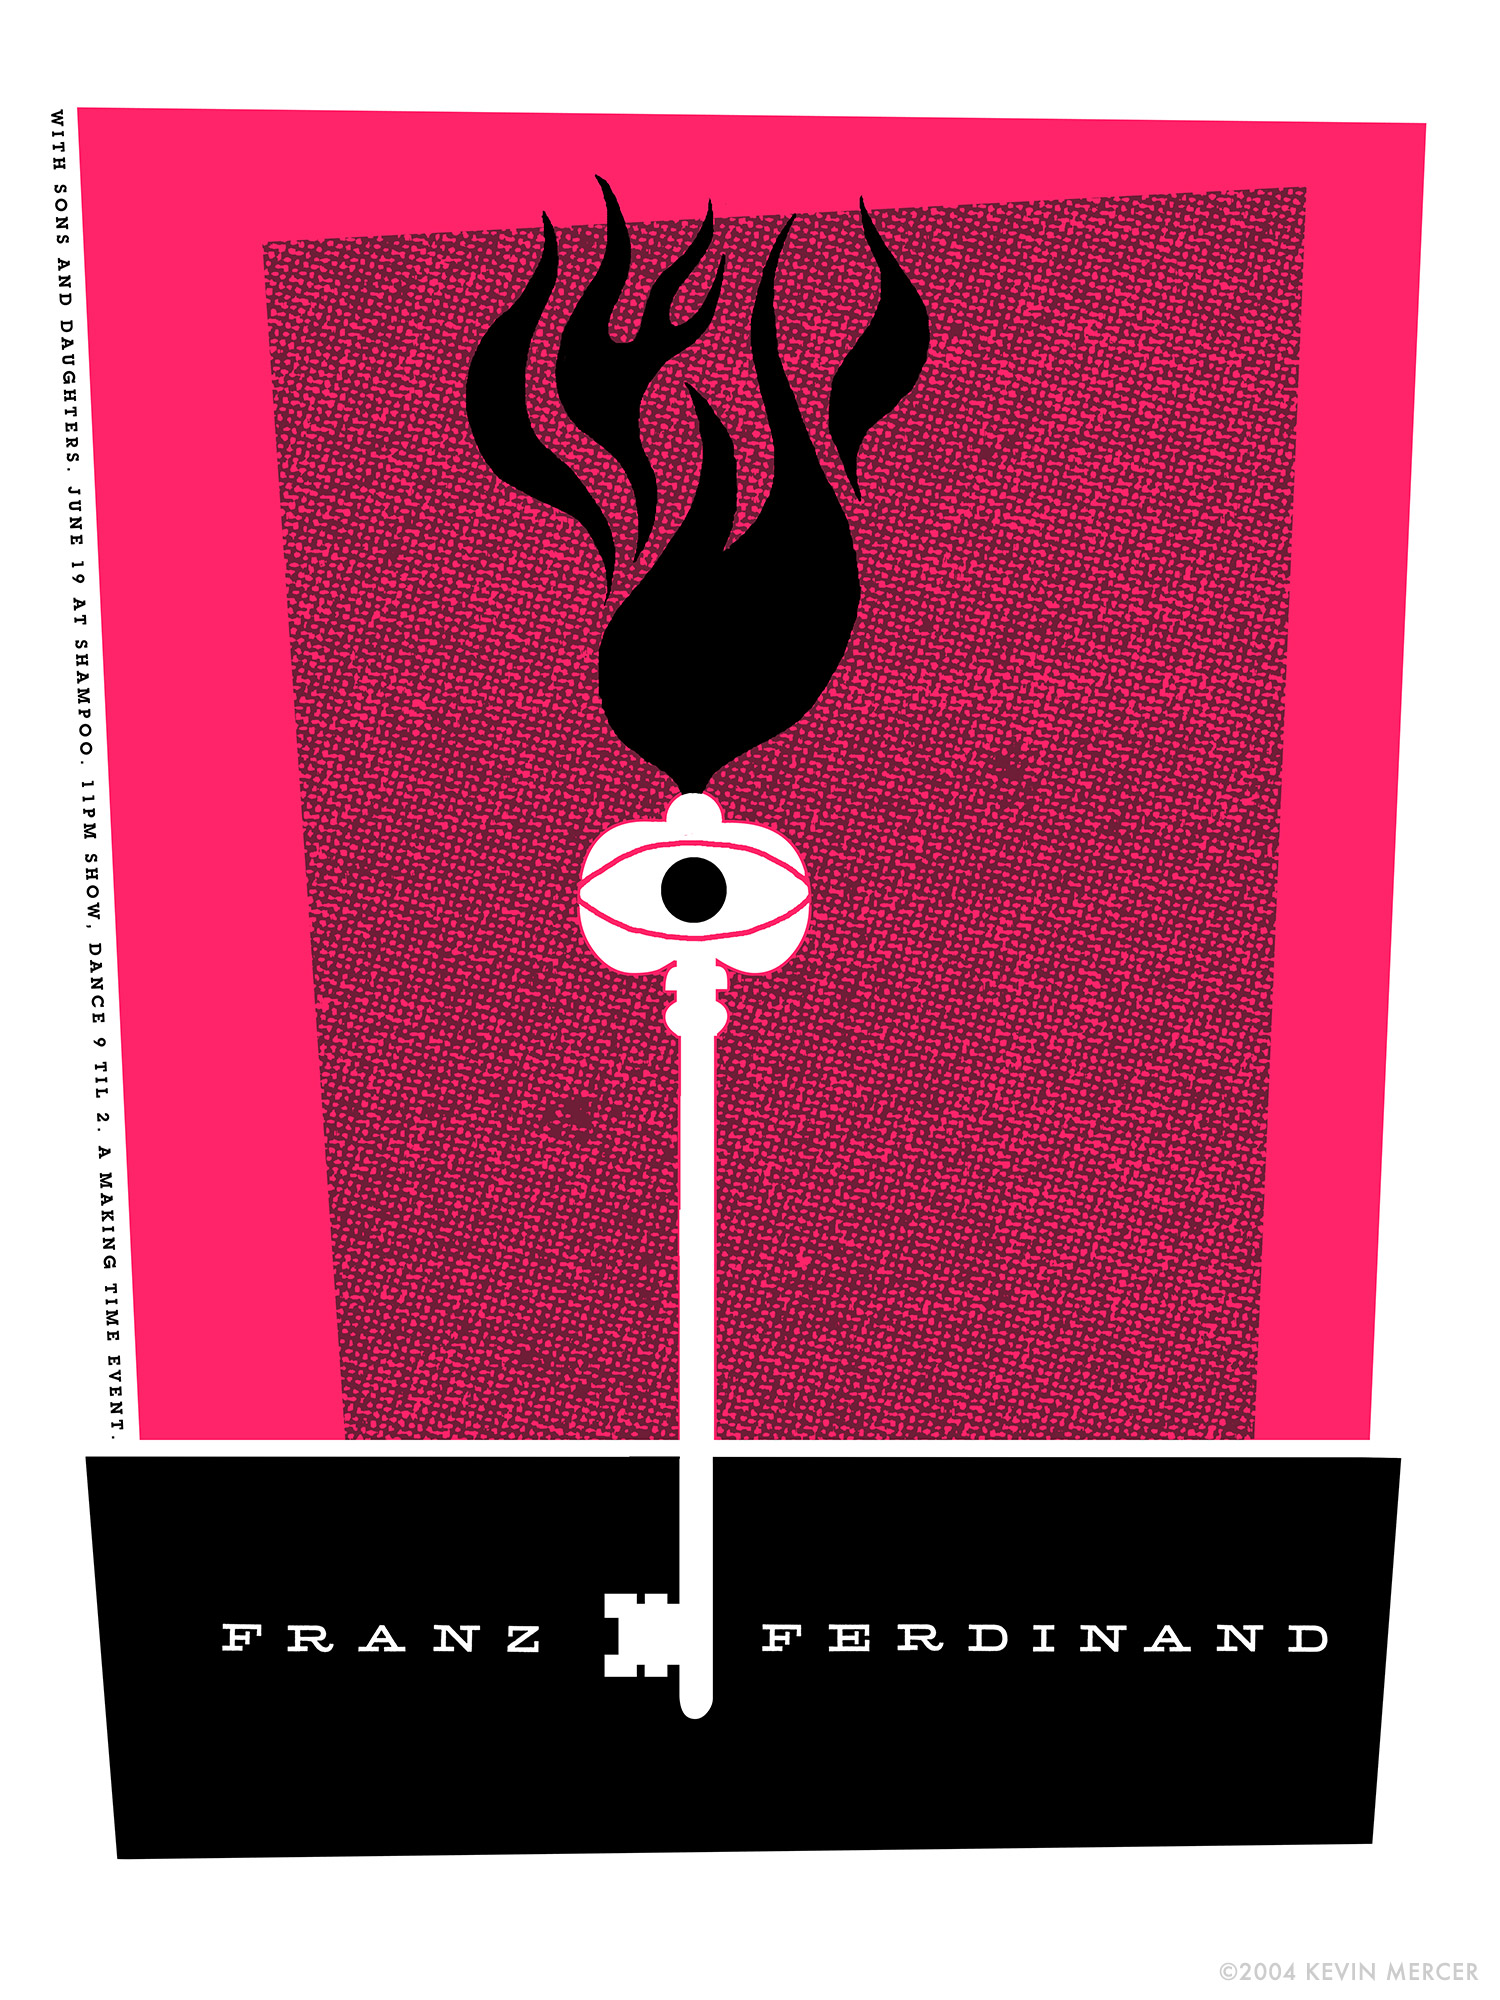 FranzFerdinand2004-1500.jpg